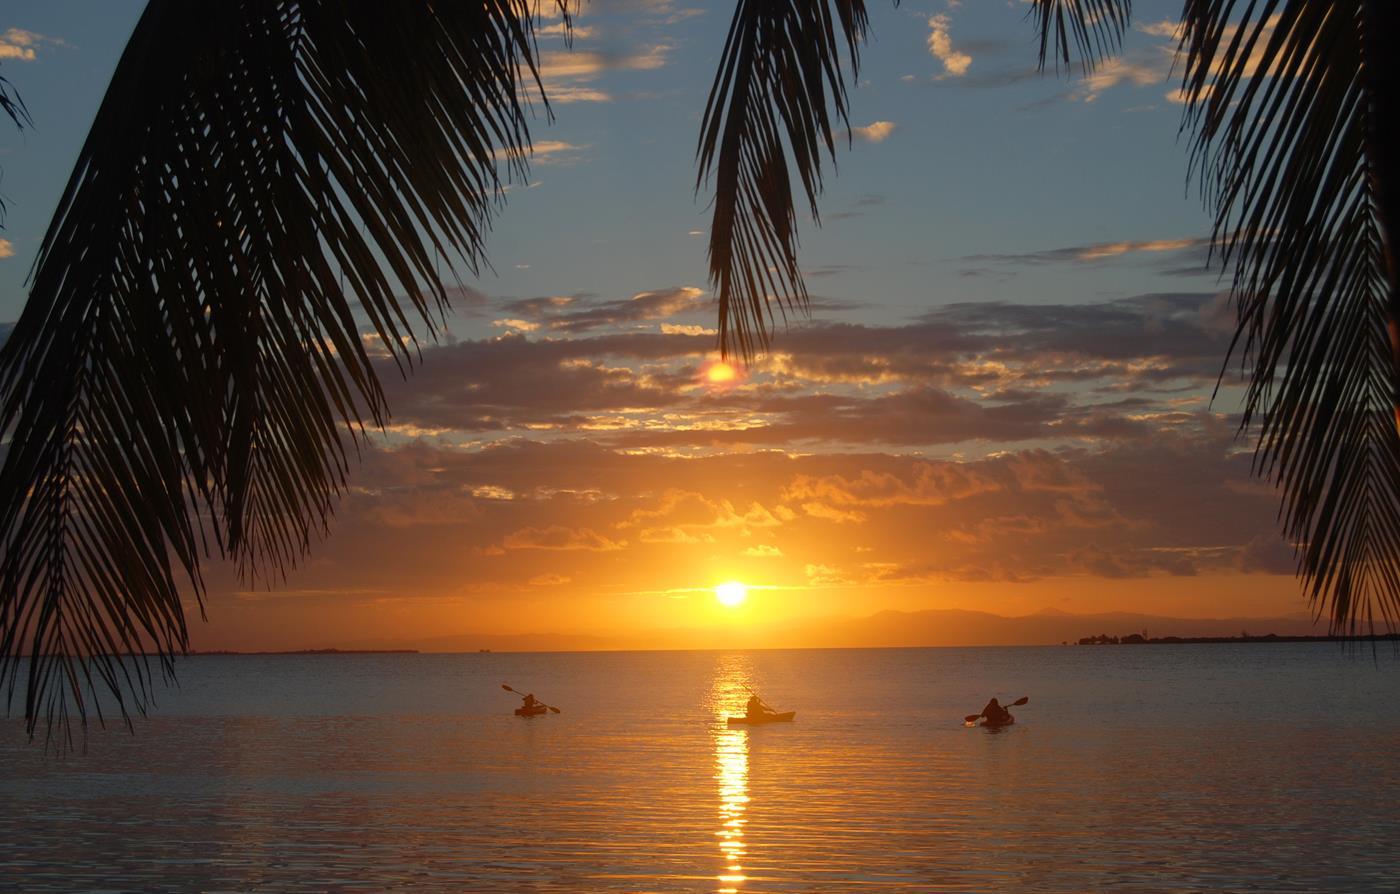 Belize adventure vacation 1 great freedom adventures